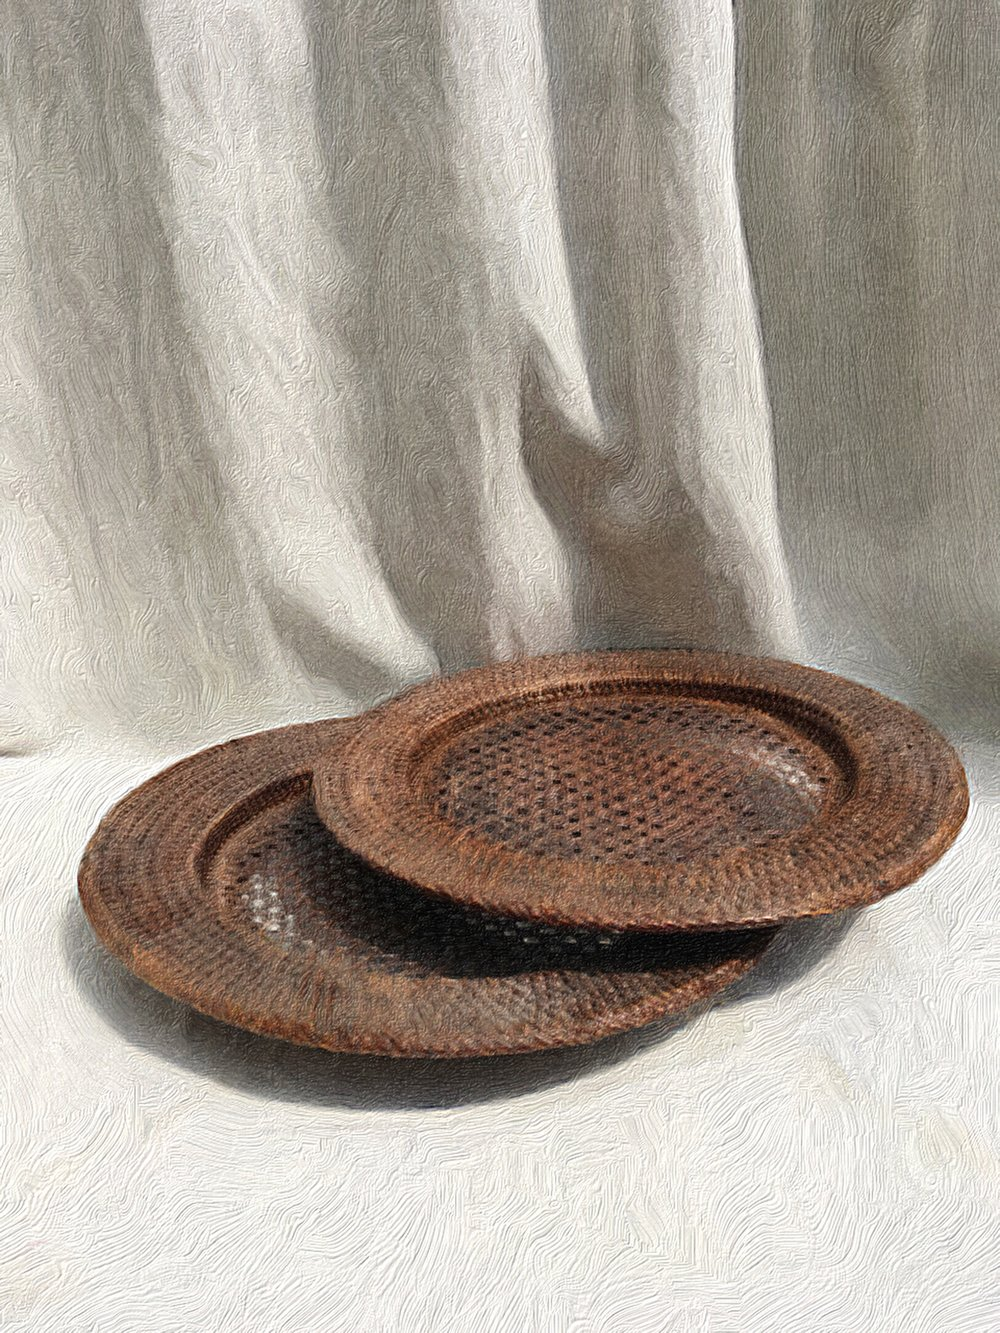 Rattan plate